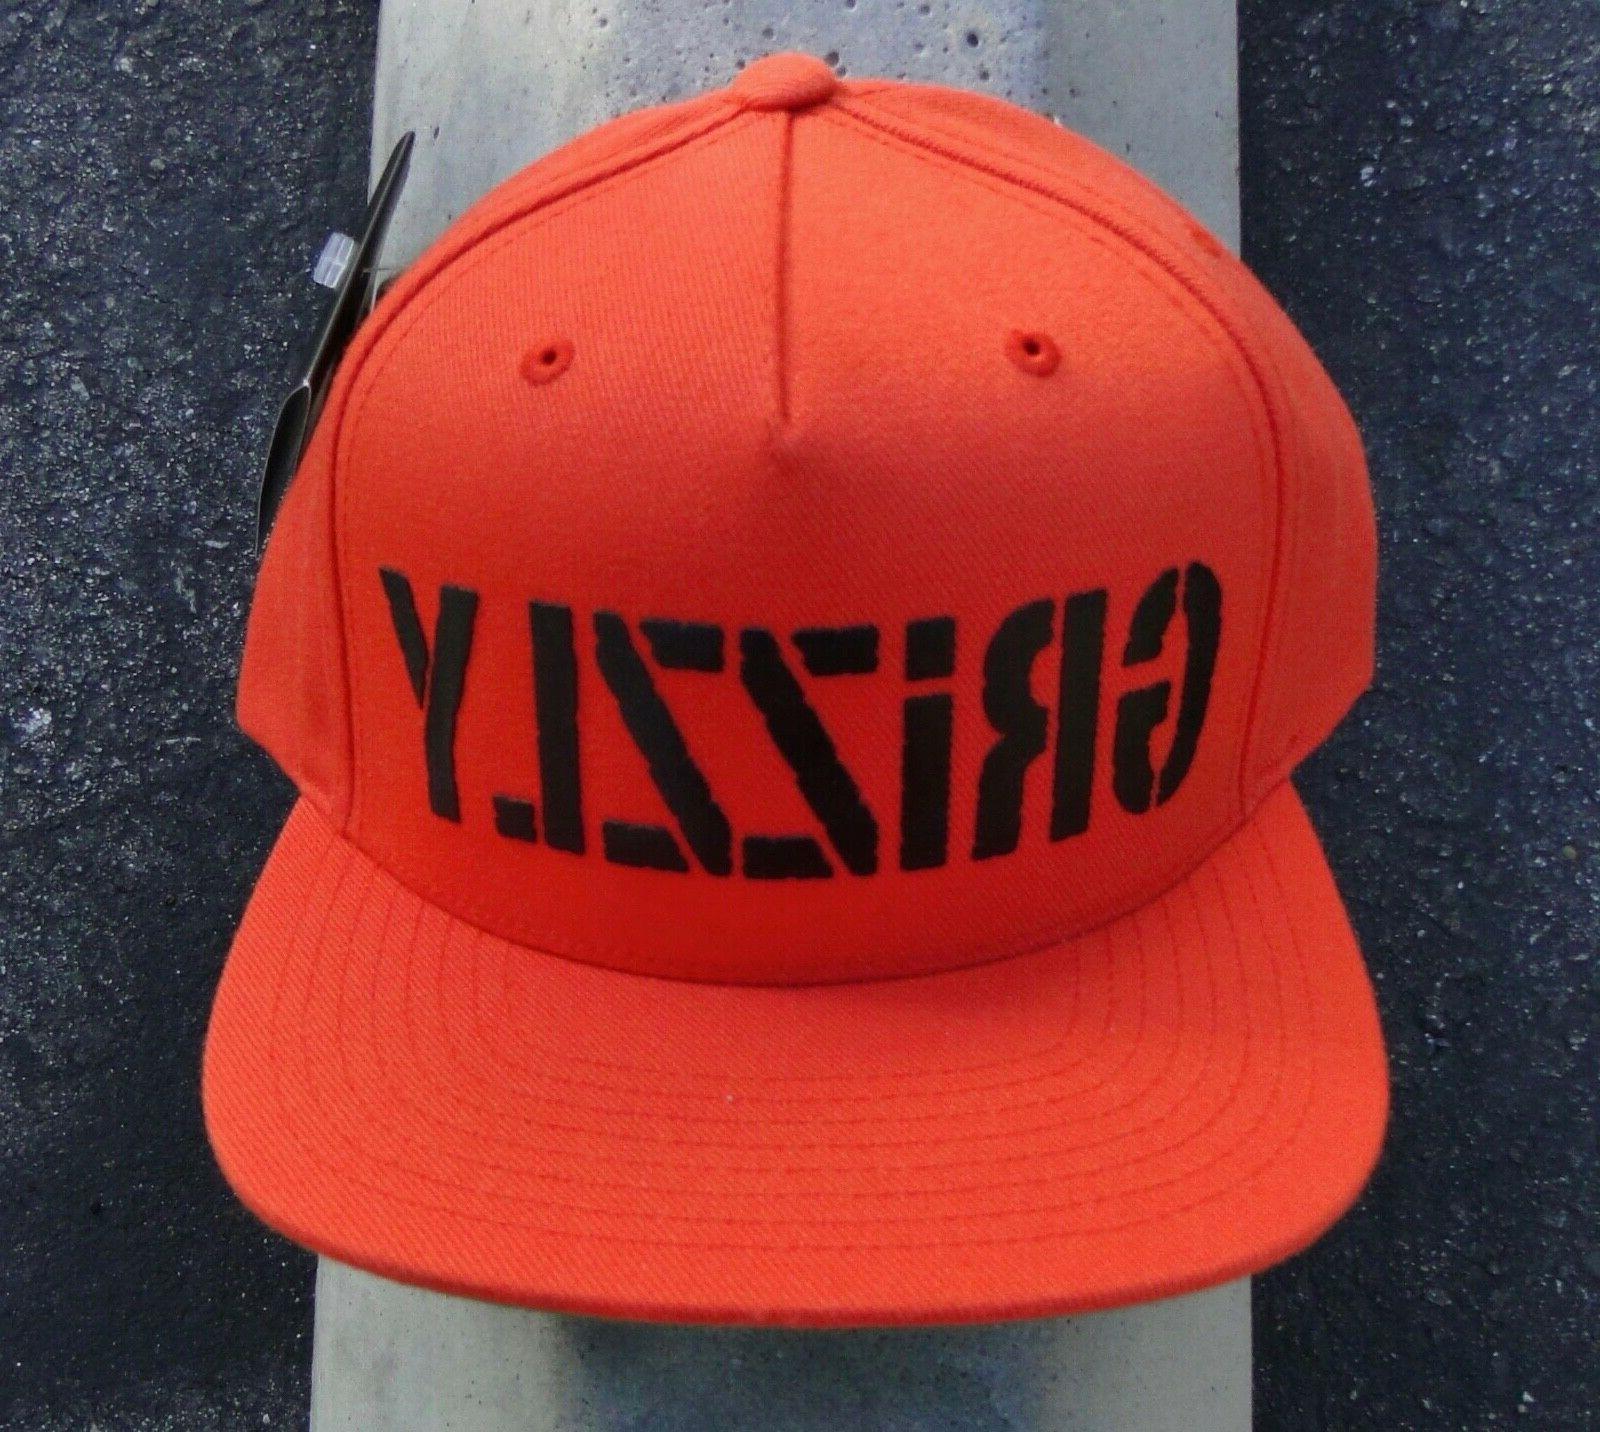 New Grizzly Grip tape Hd Stamp Logo Orange Snapback Hat HTDM